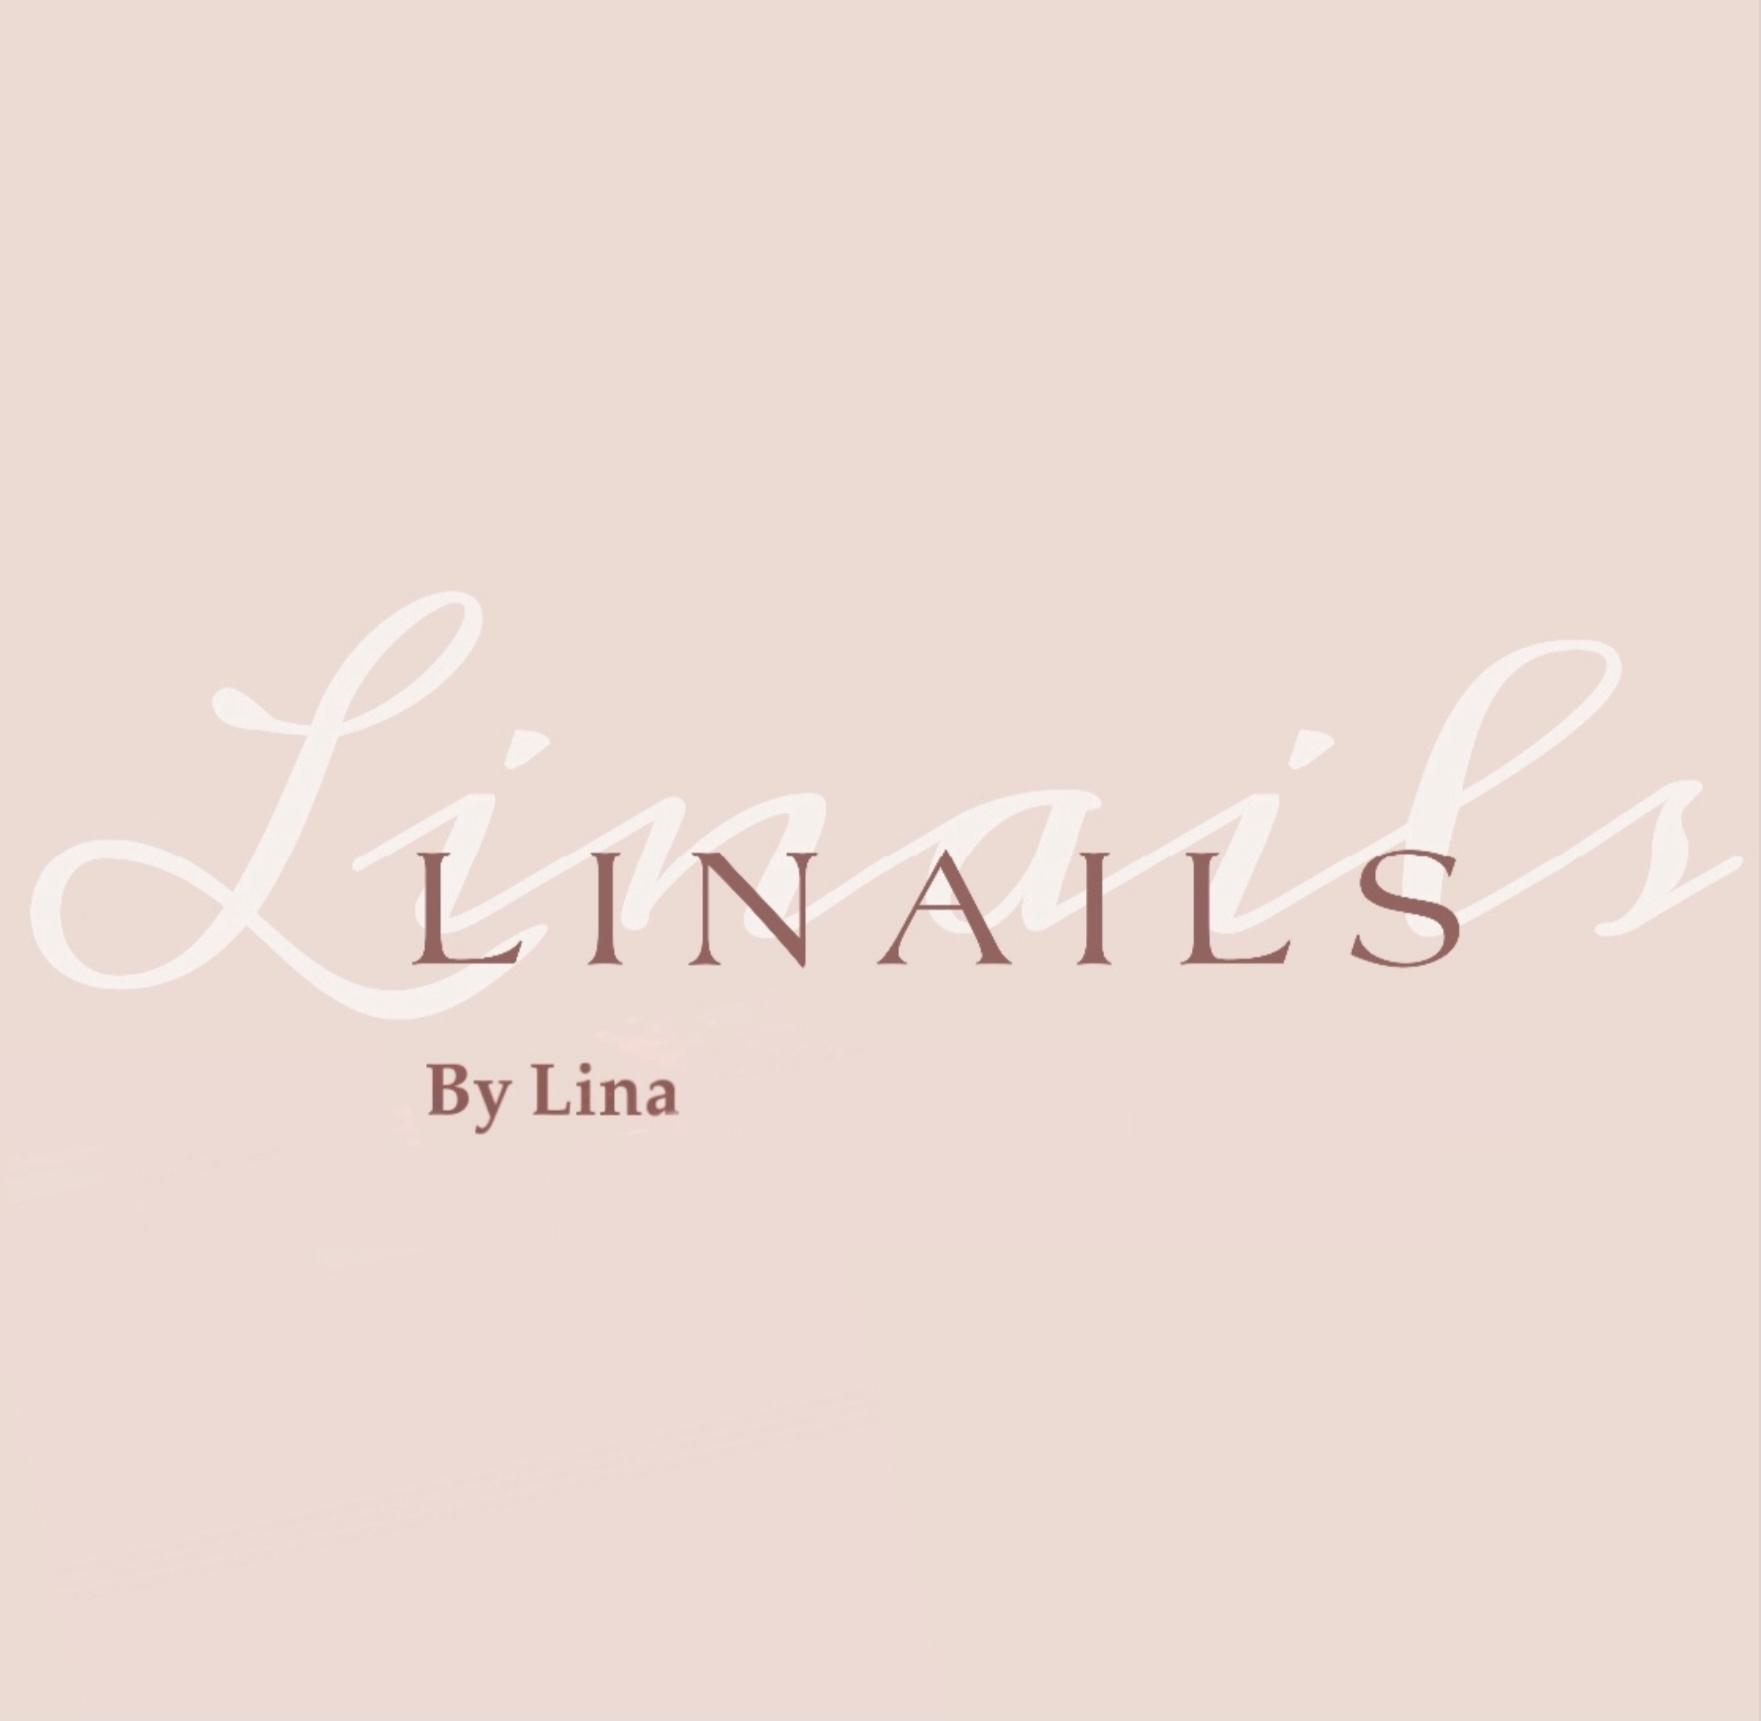 https://www.mncjobsgulf.com/company/linails